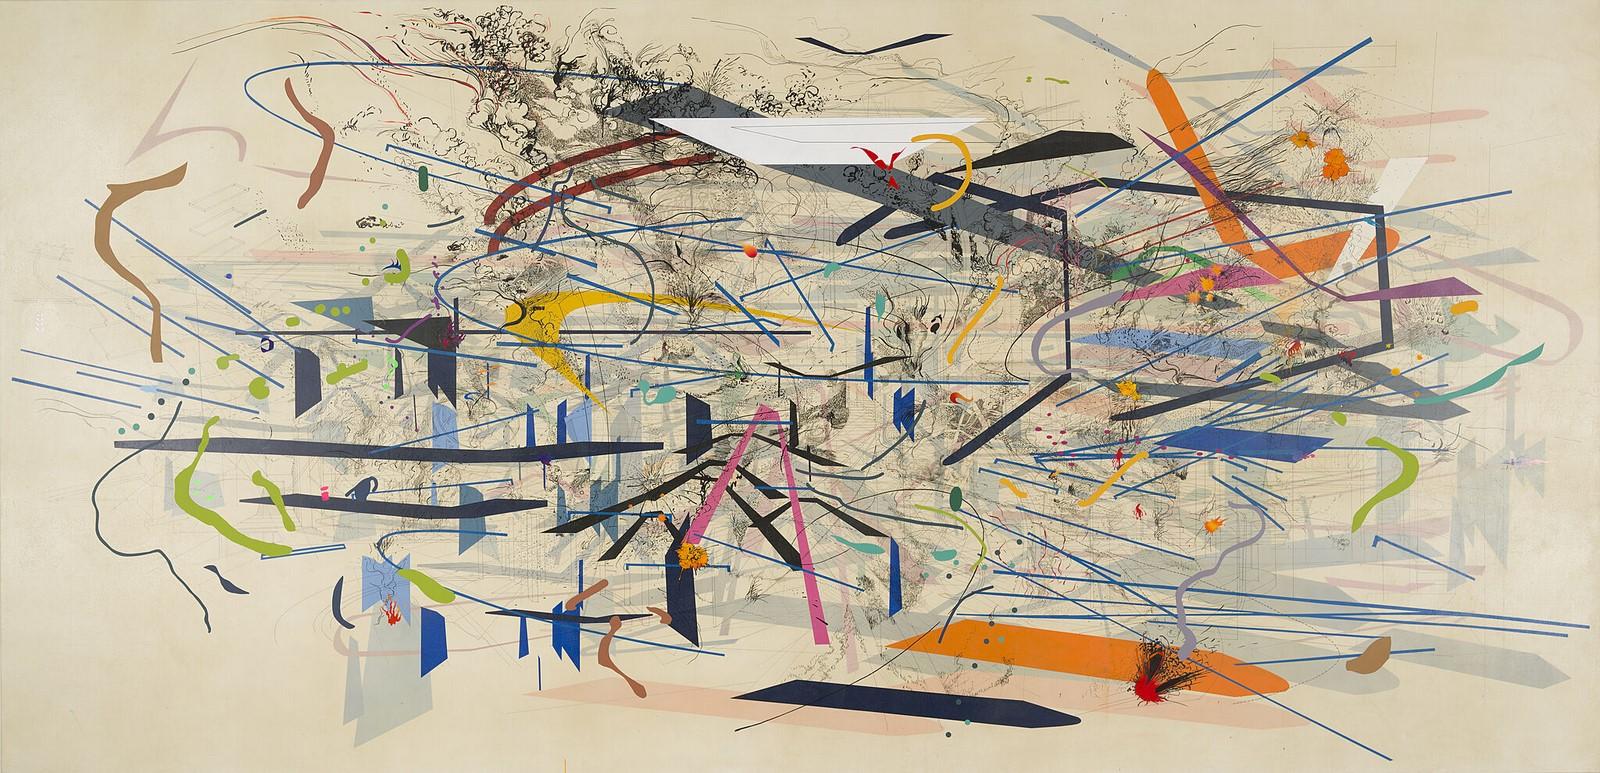 Daniel Mullen: Merging Art and Architecture through painting - Sheet15